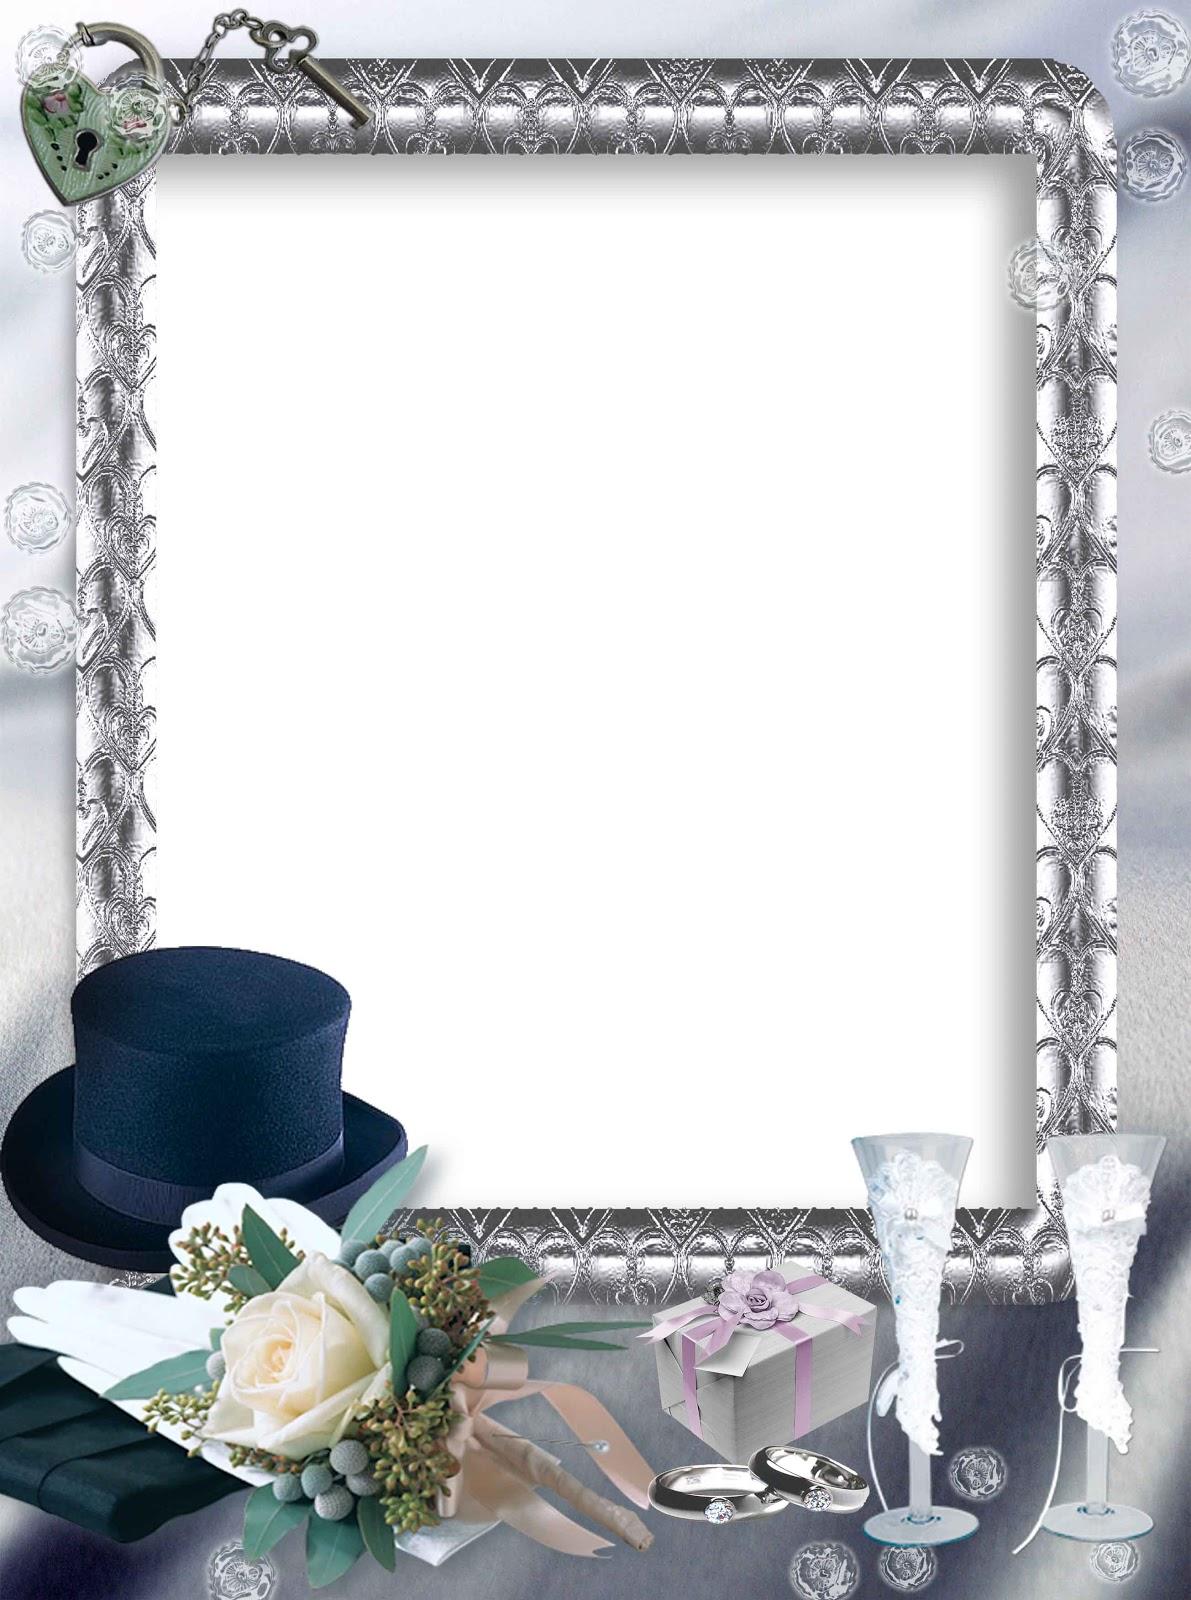 photo frame wedding png image 35188